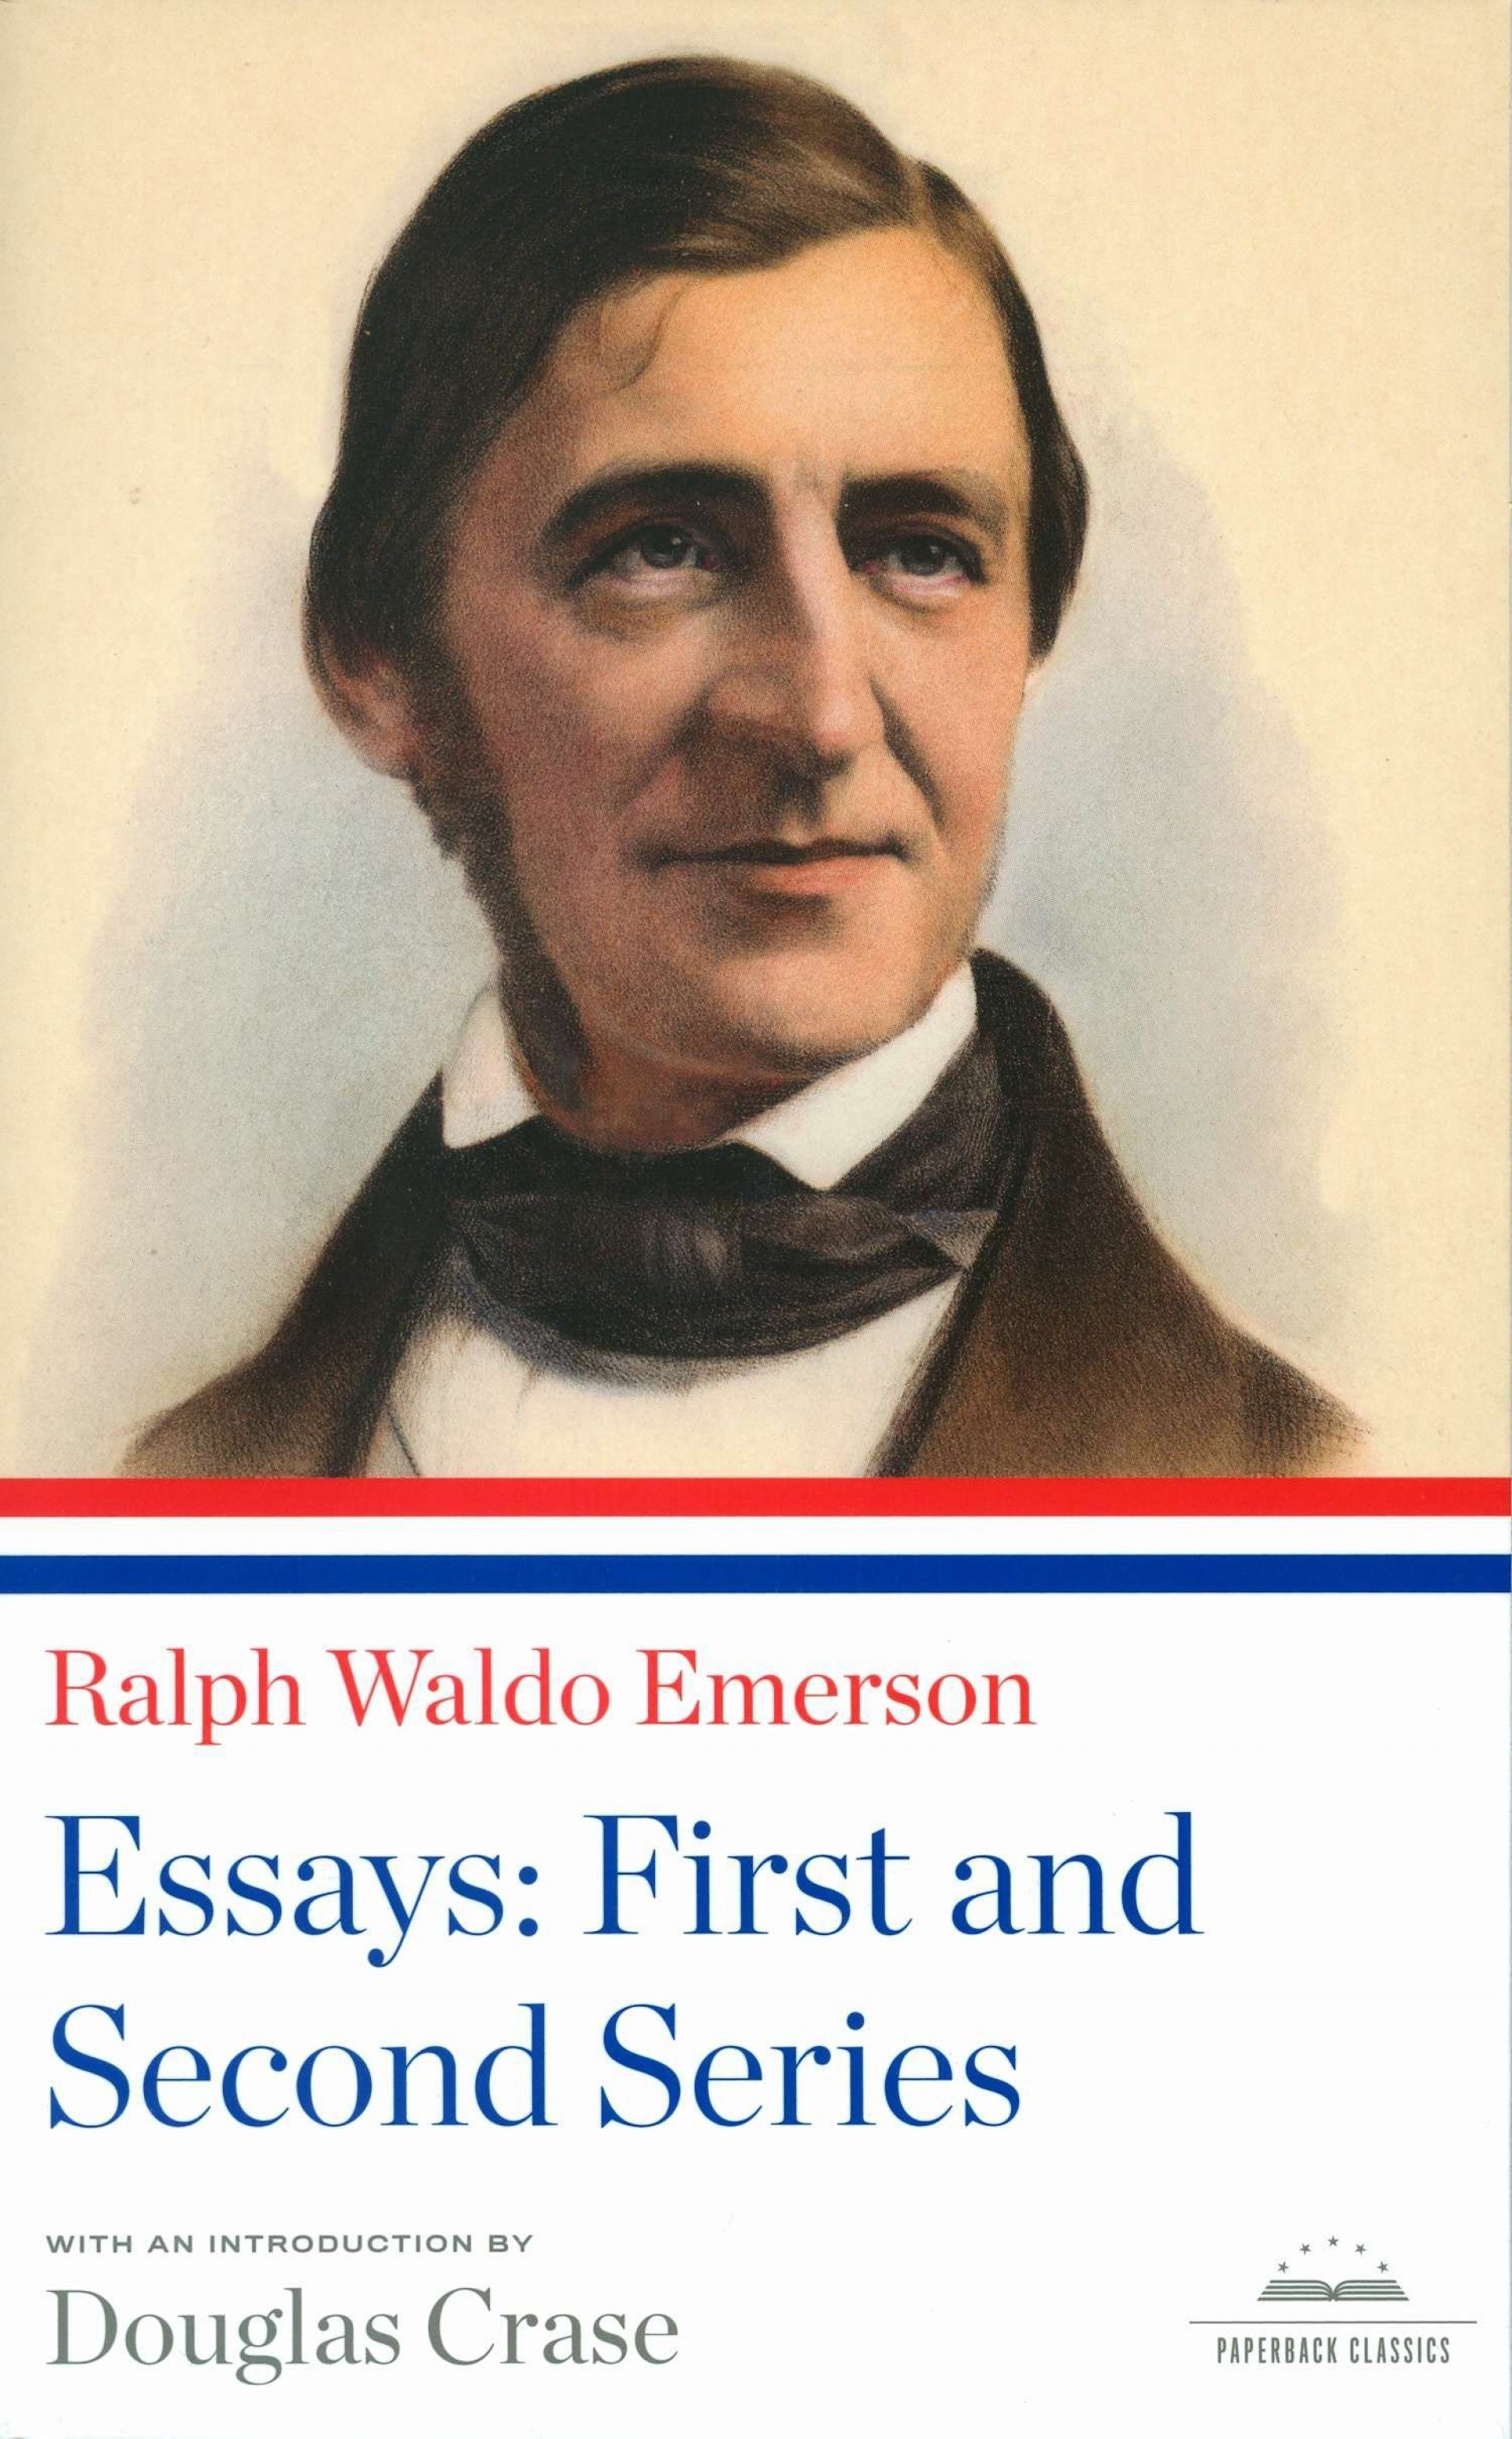 005 81bbtjzup6l Essay Example Emerson Dreaded Essays Ralph Pdf First Series Summary Waldo Nature 1920